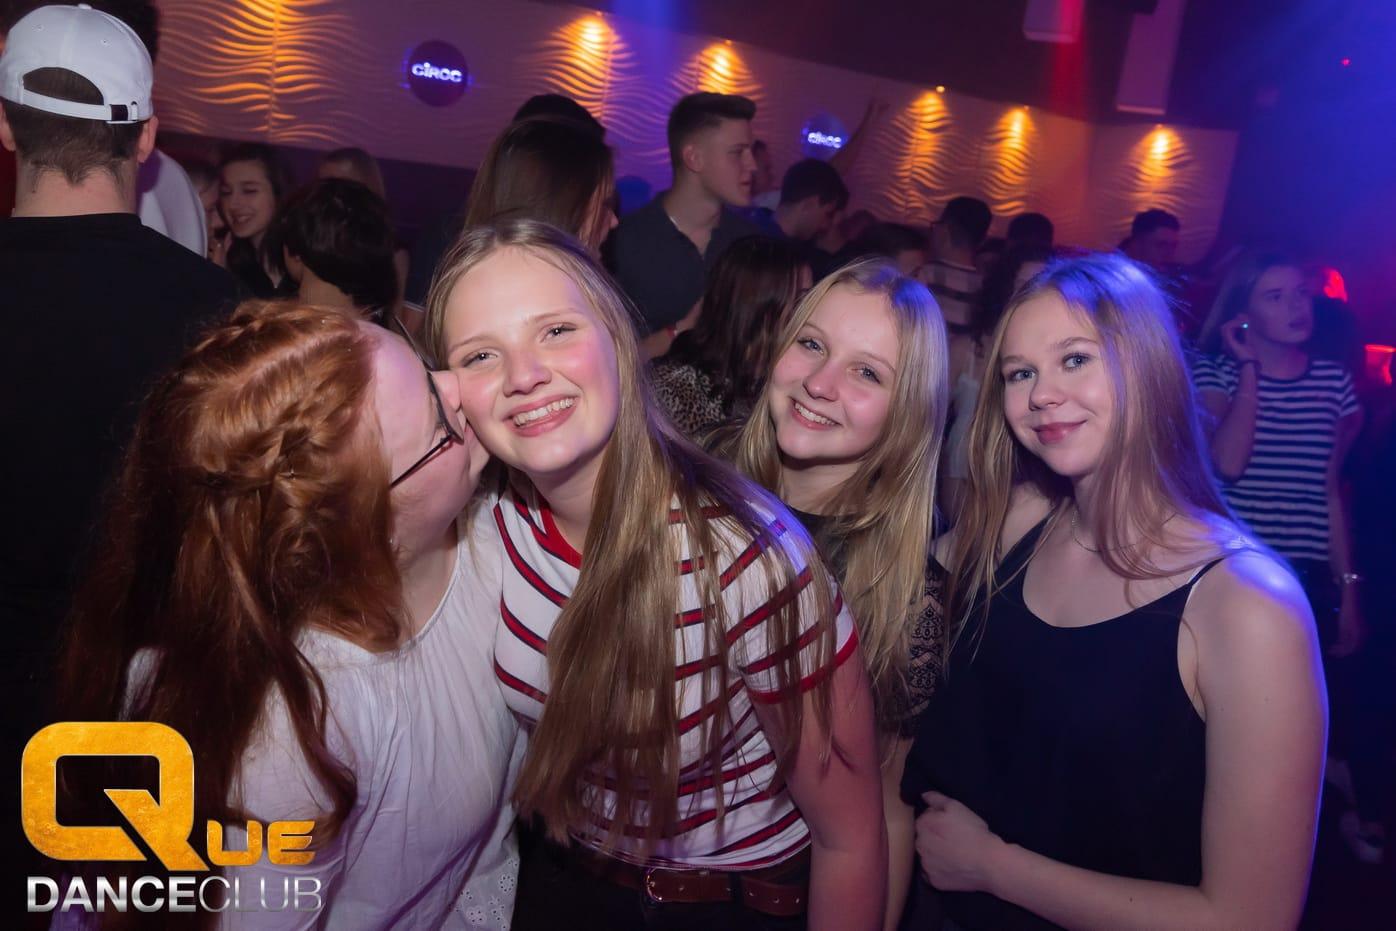 2018_12_20_Que_Danceclub_XMAS_Abiparty_United_Nightlife_Scene_Timo_019